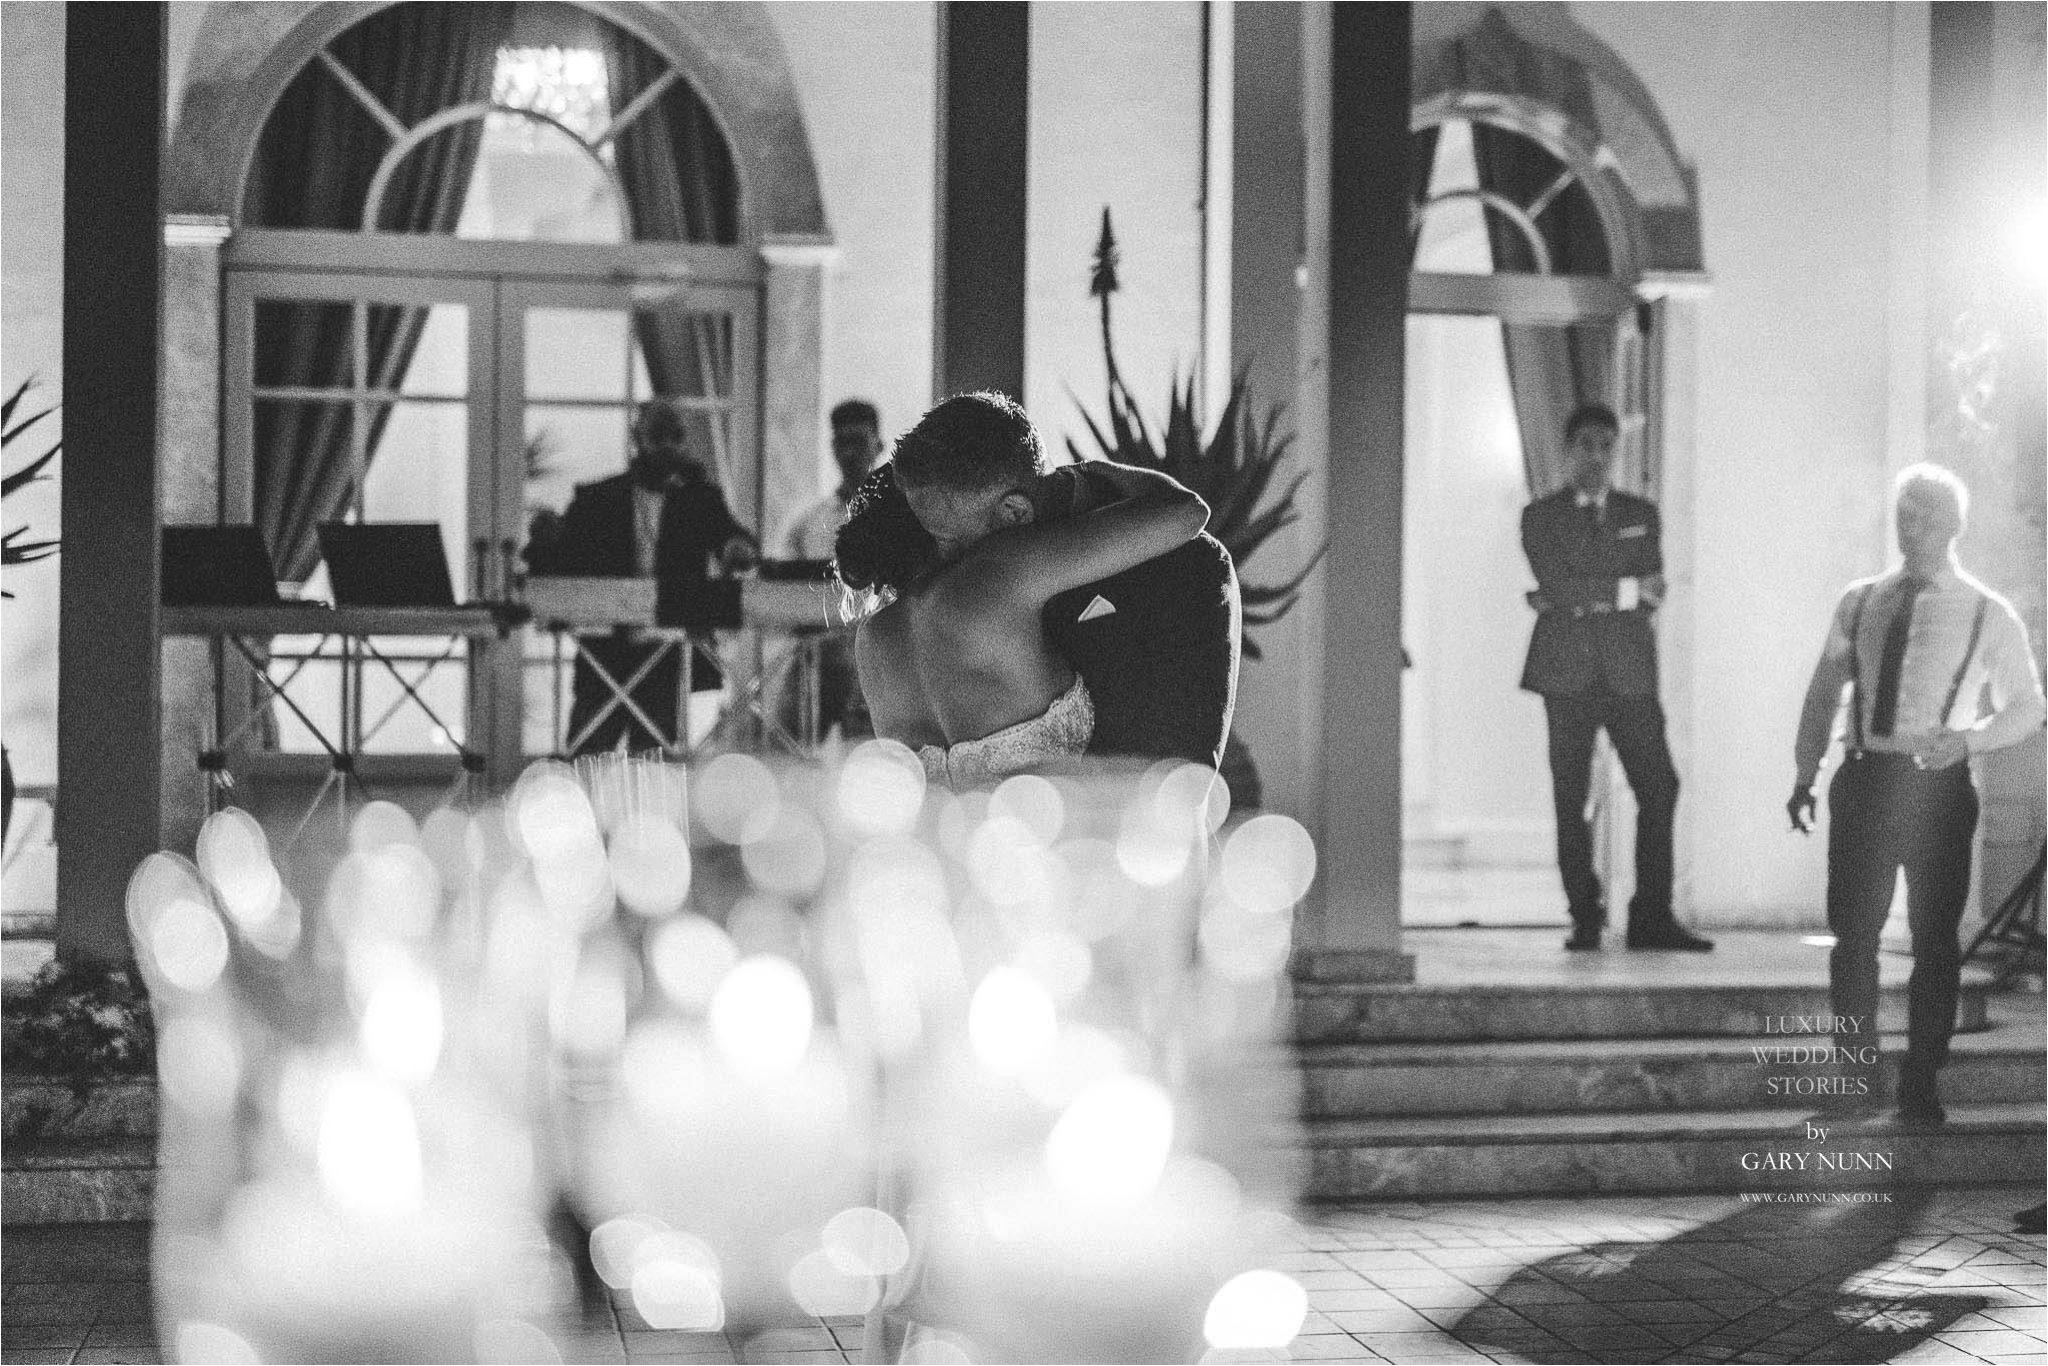 grand hotel Timeo wedding, belmond grand hotel timeo, destination wedding photographer italy, Gary Nunn Photography, grand hotel timeo, mount etna, sicily, sicily wedding photography, top 10 wedding photographers, wedding photograpgher leighton buzzard, weddings in Taormina